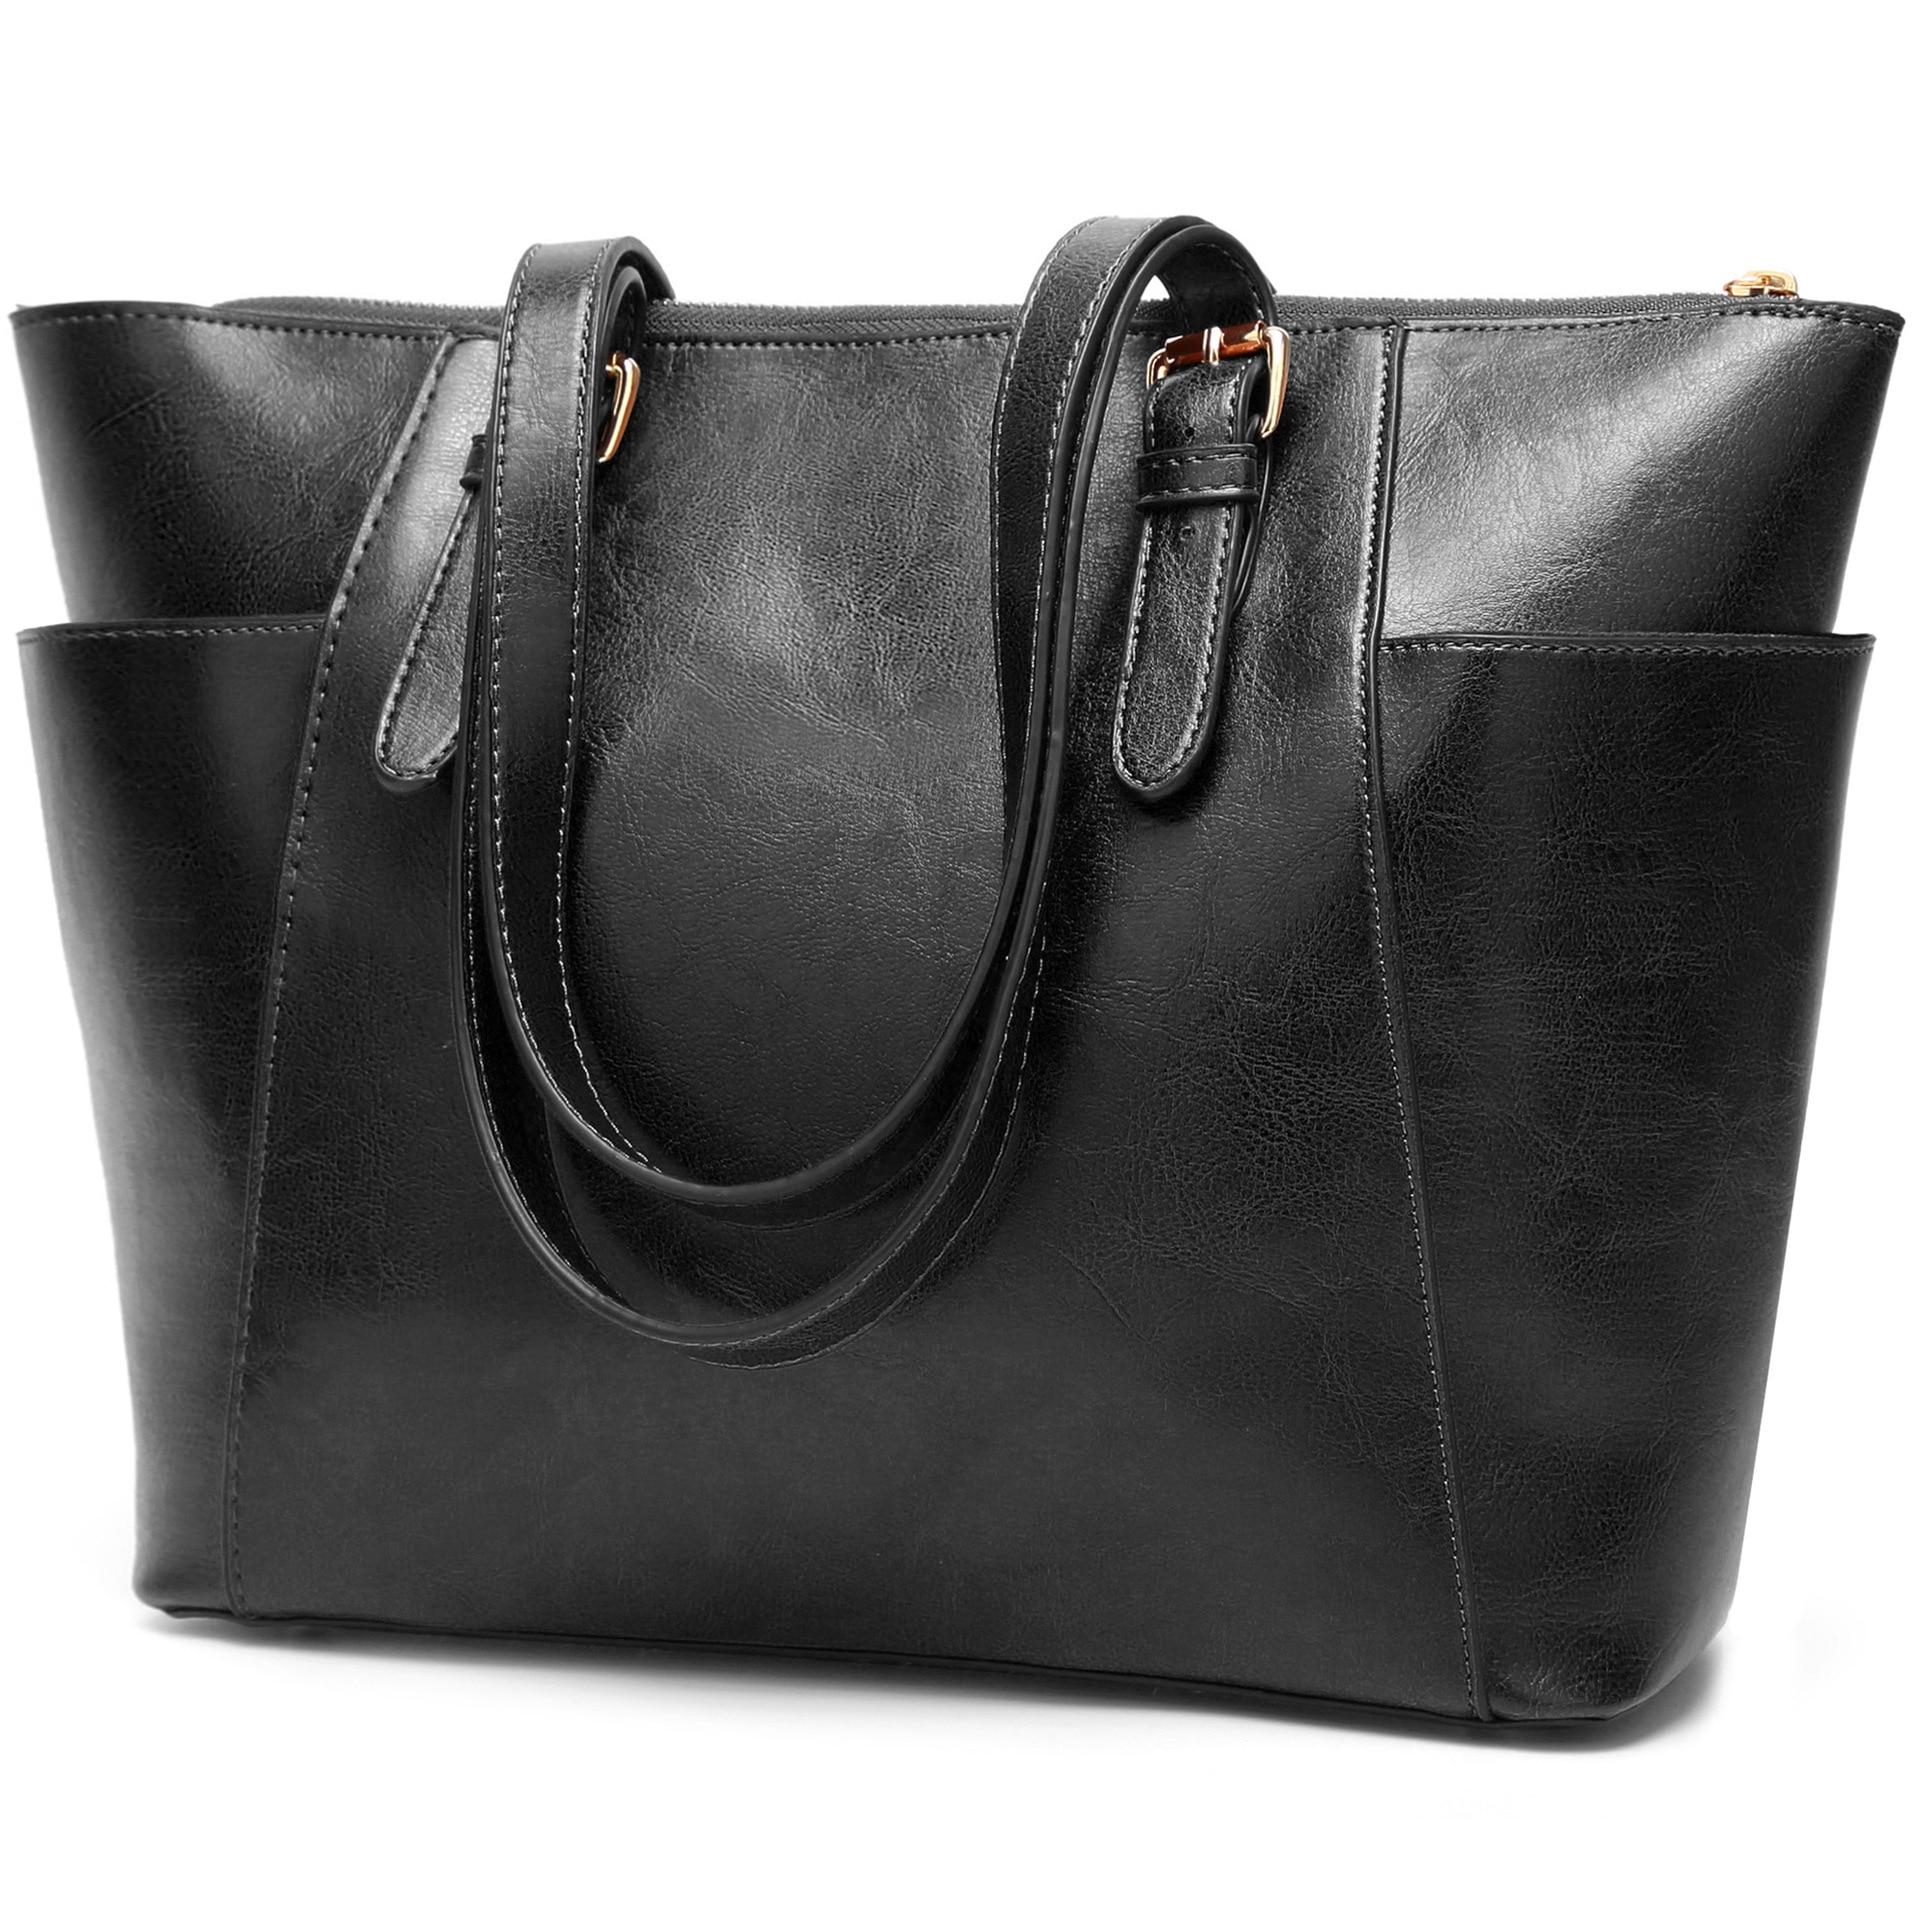 Leather Hobos Luxury Handbags Women Bags Designer Handbags High Quality Crossbody Bags For Women Shoulder Bag Sac A Main N412